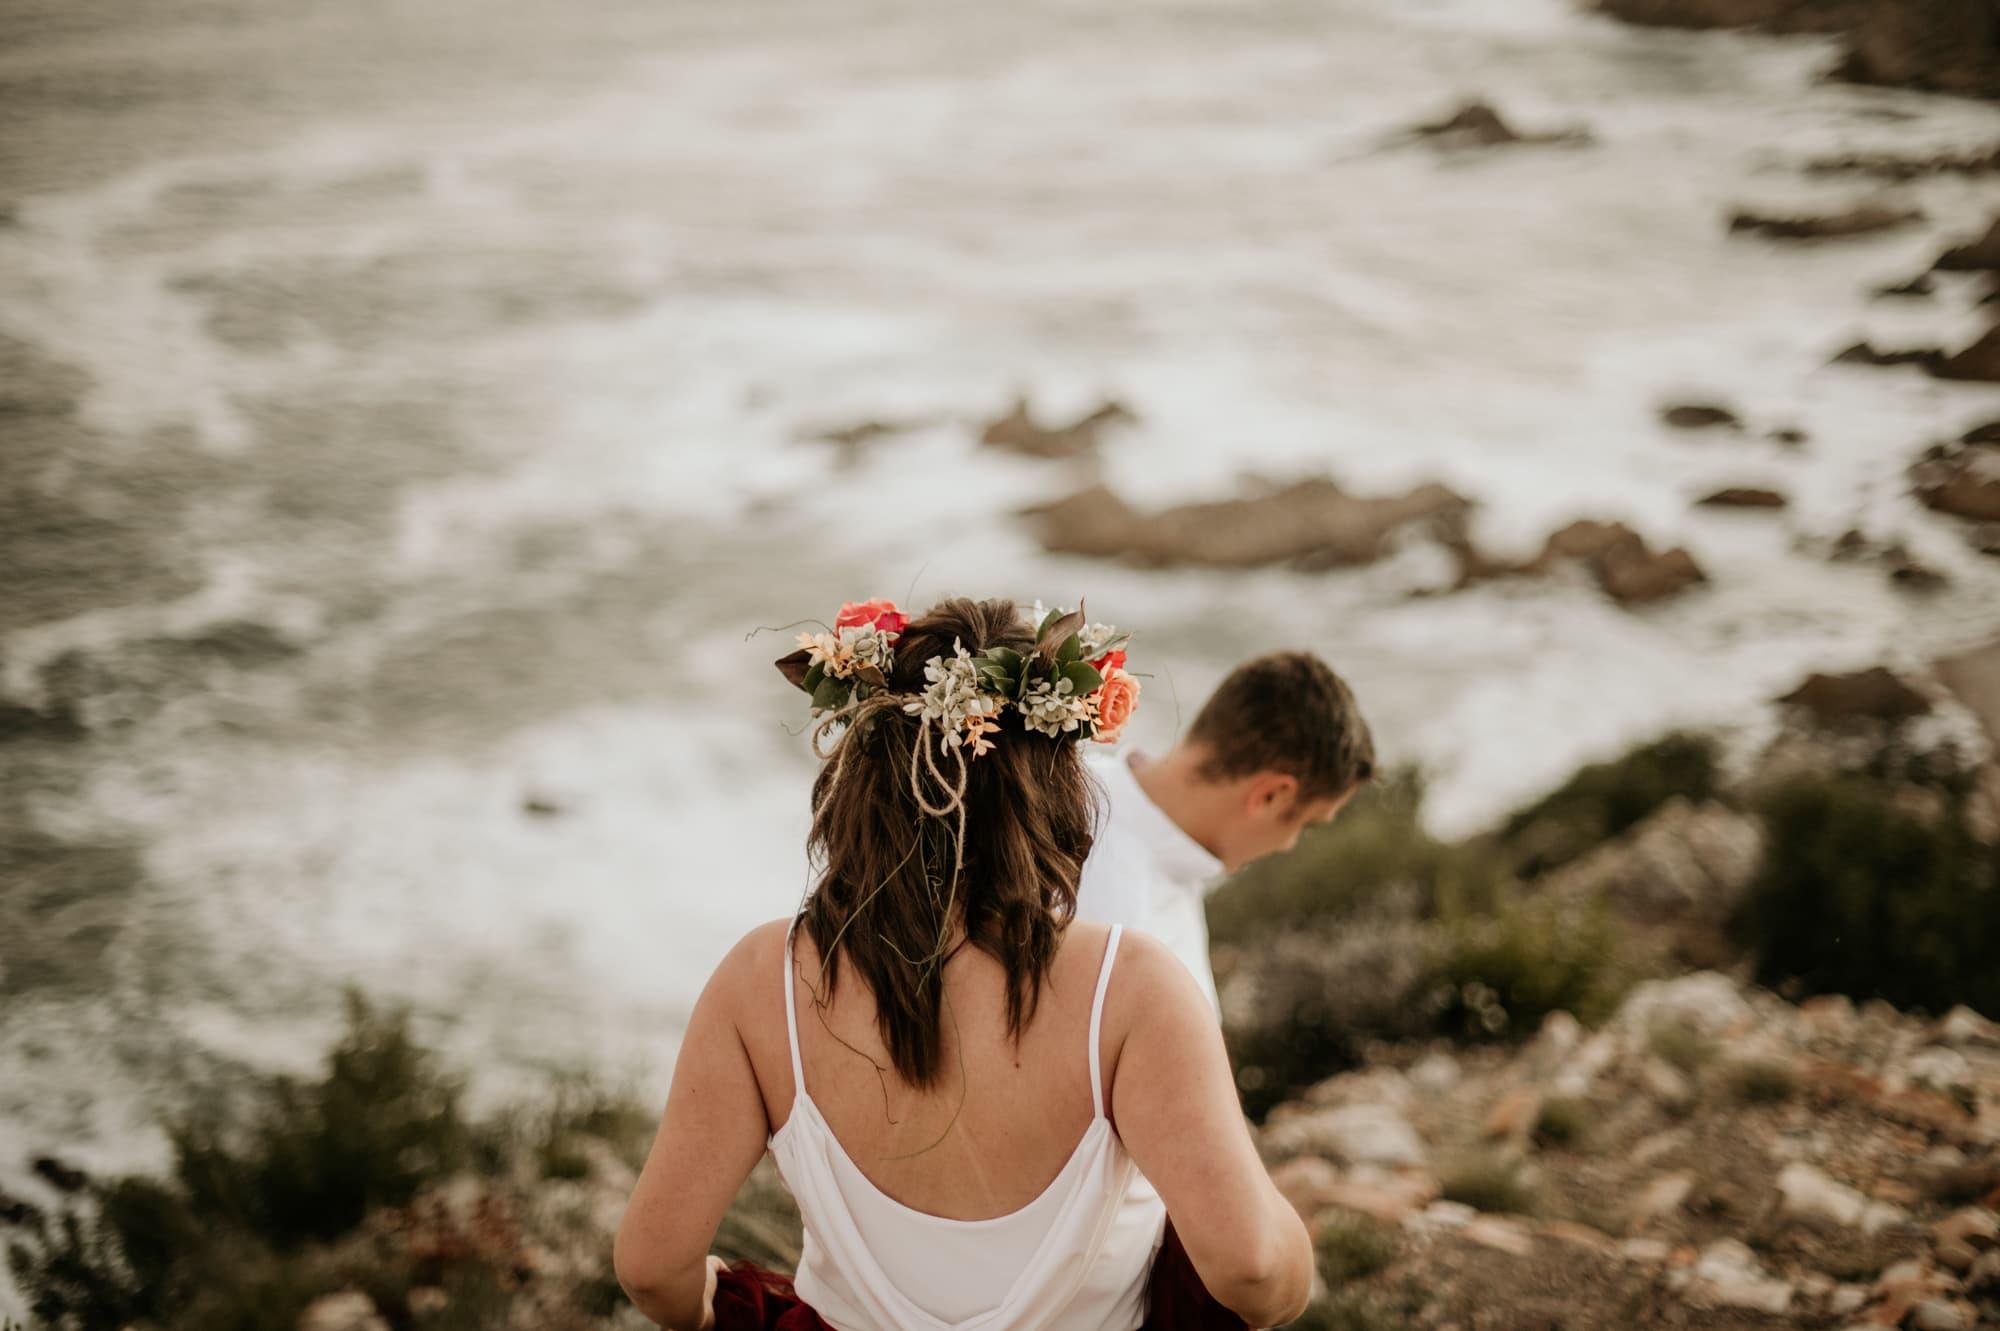 jesann-freddie-kranshoek-engagement-June-Richards-Photography-Destination-Weddings-Elopements-Garden-Route-07